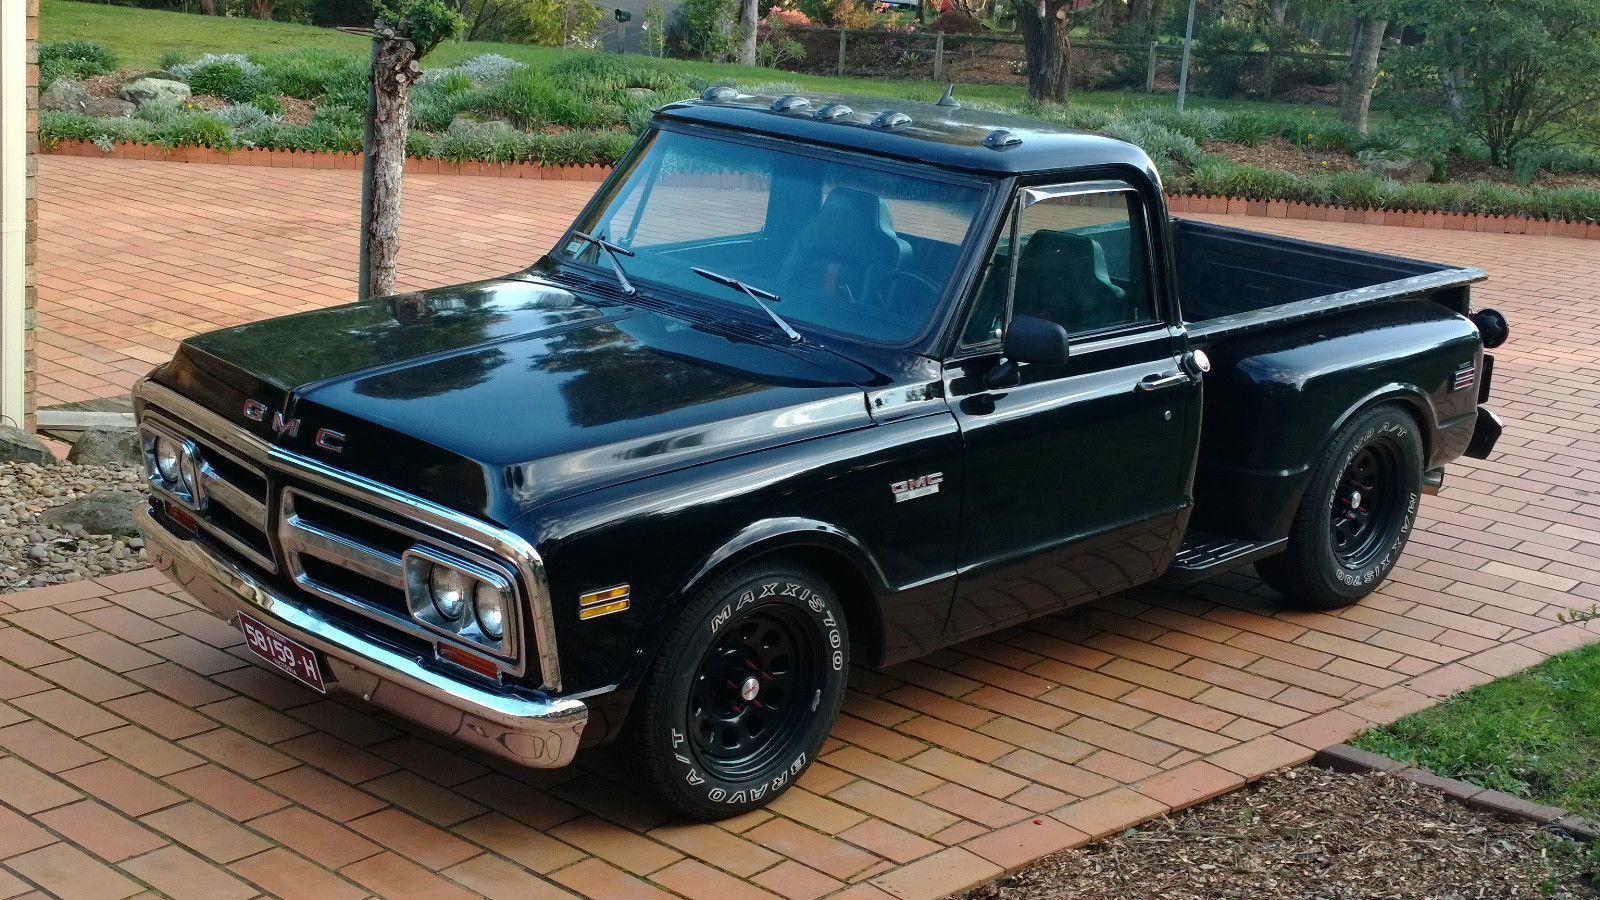 1972 72 gmc stepside pickup 350 auto like c10 chev nice patina in vic ebay